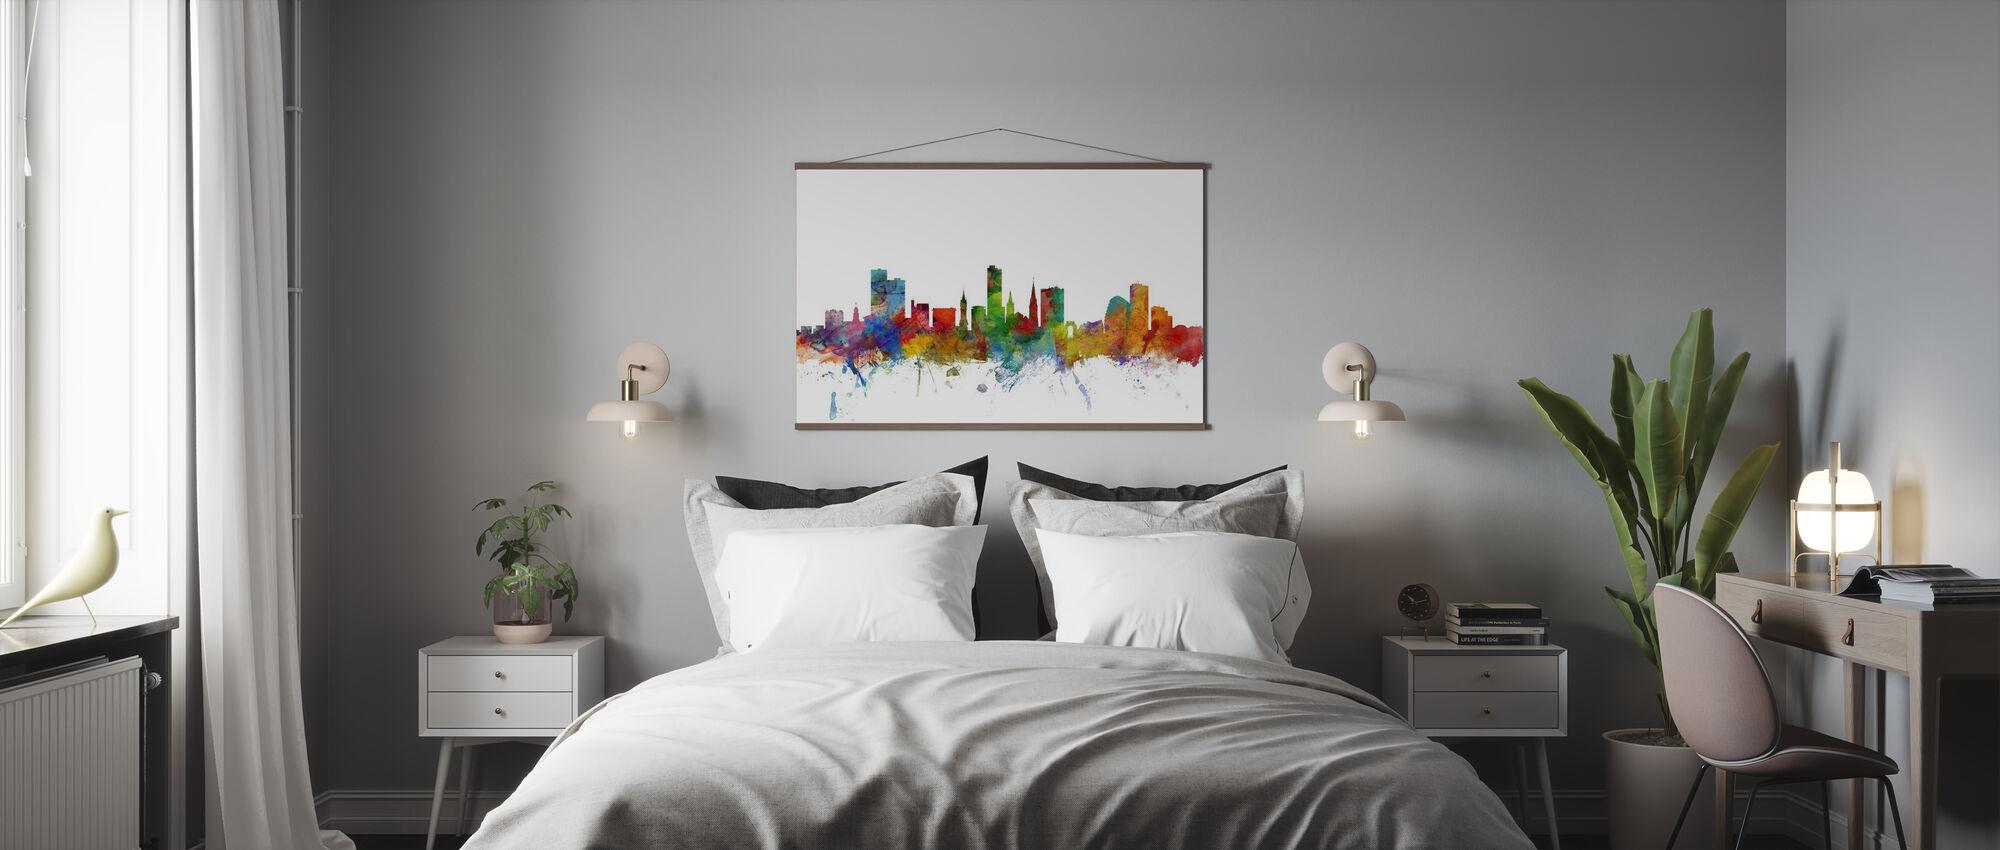 Leicester England Skyline - Poster - Bedroom